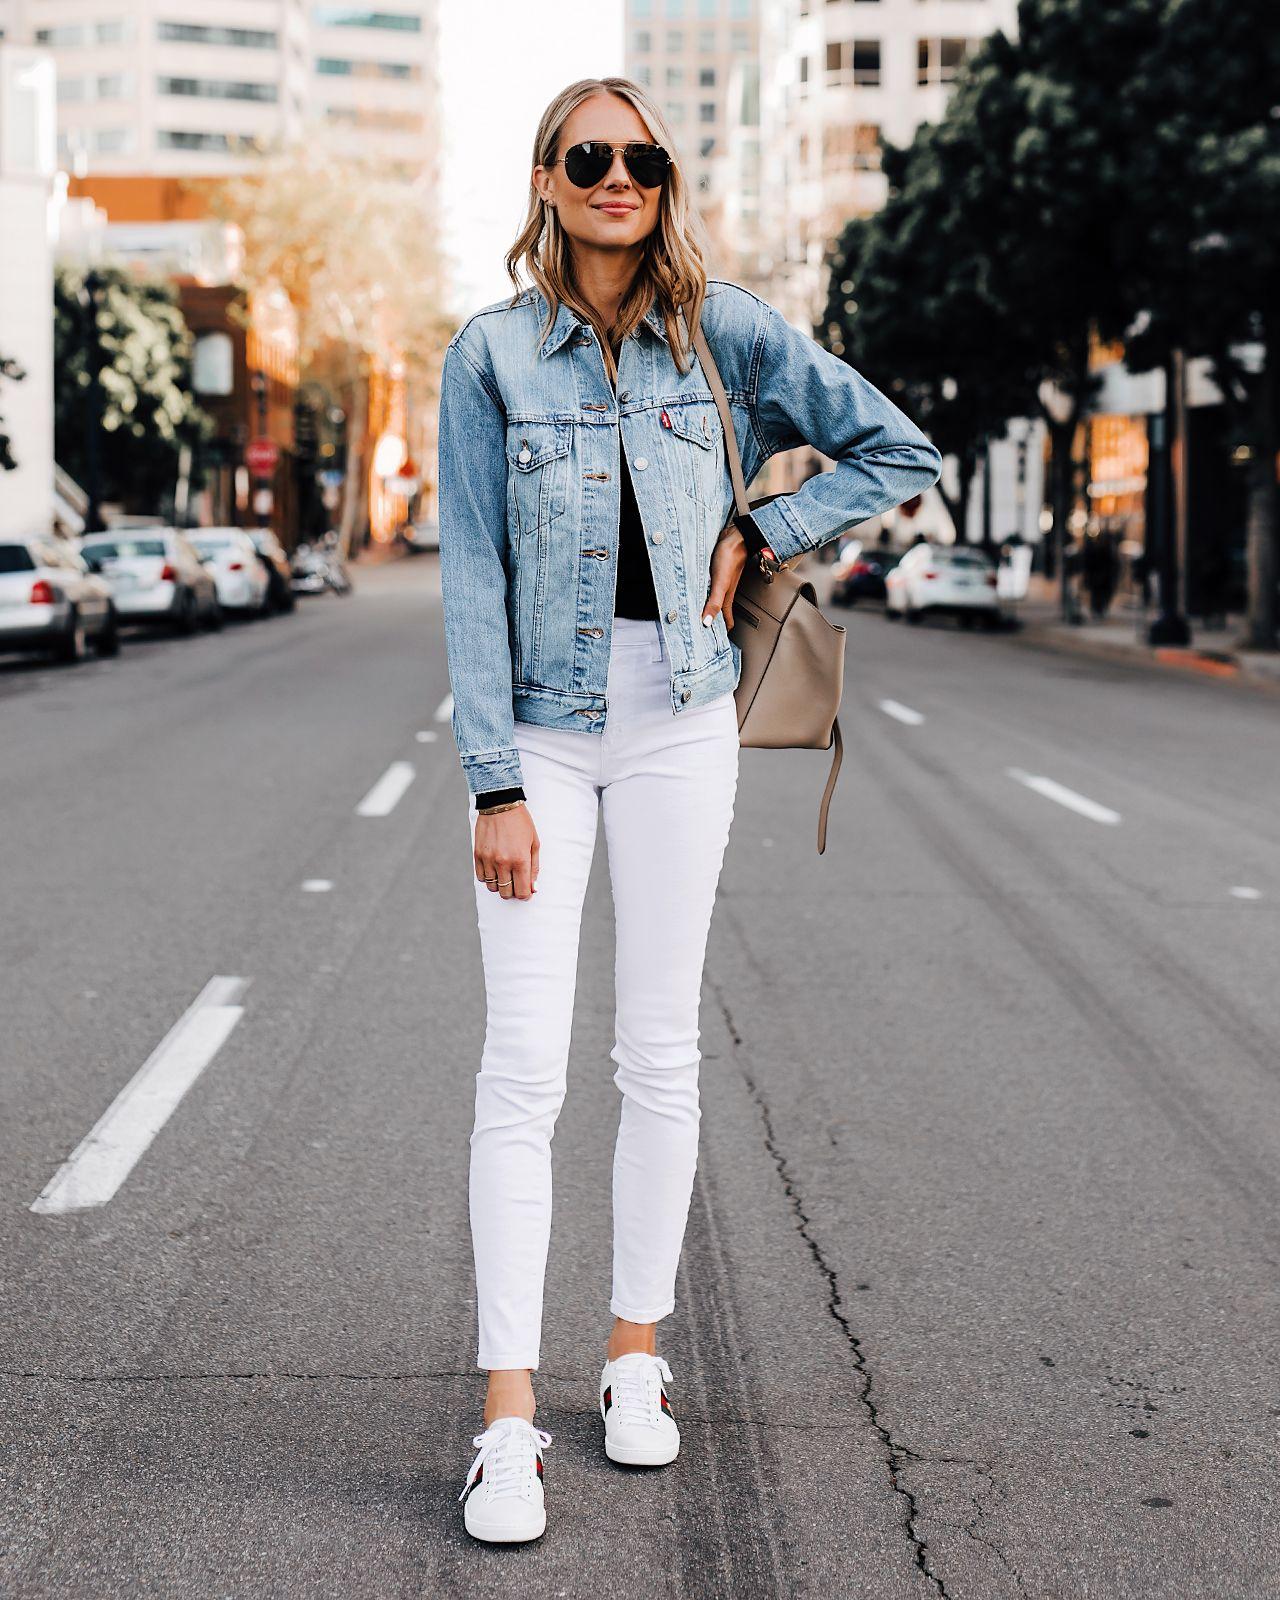 8474a62a1e6 Fashion Jackson Wearing Levis Denim Jacket White Skinny Jeans ...